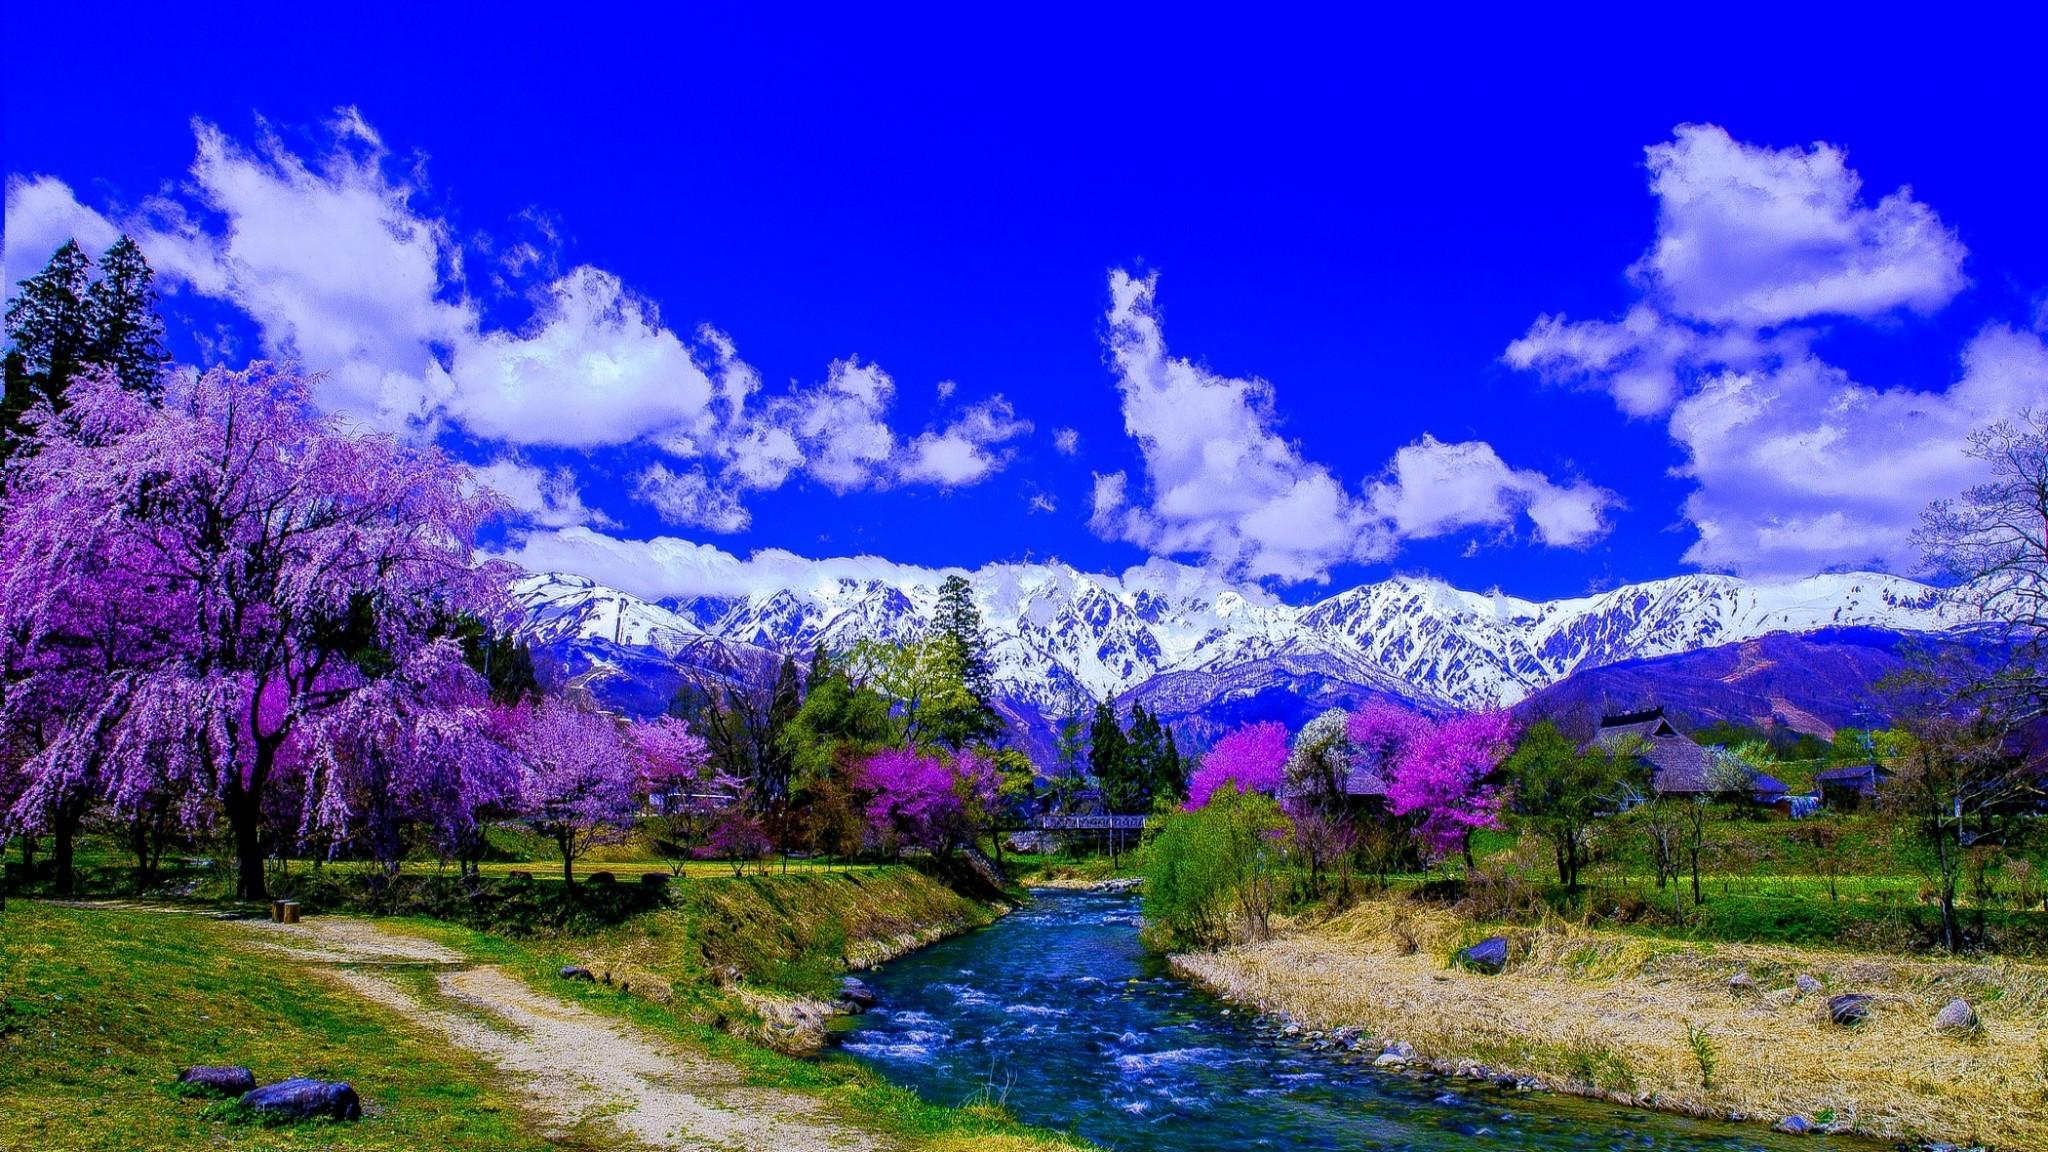 Res: 2048x1152, Fotografie - Landschaft Lila Baum Blüte Gebirge Snow Japan Fluss Erde/Natur  Wallpaper